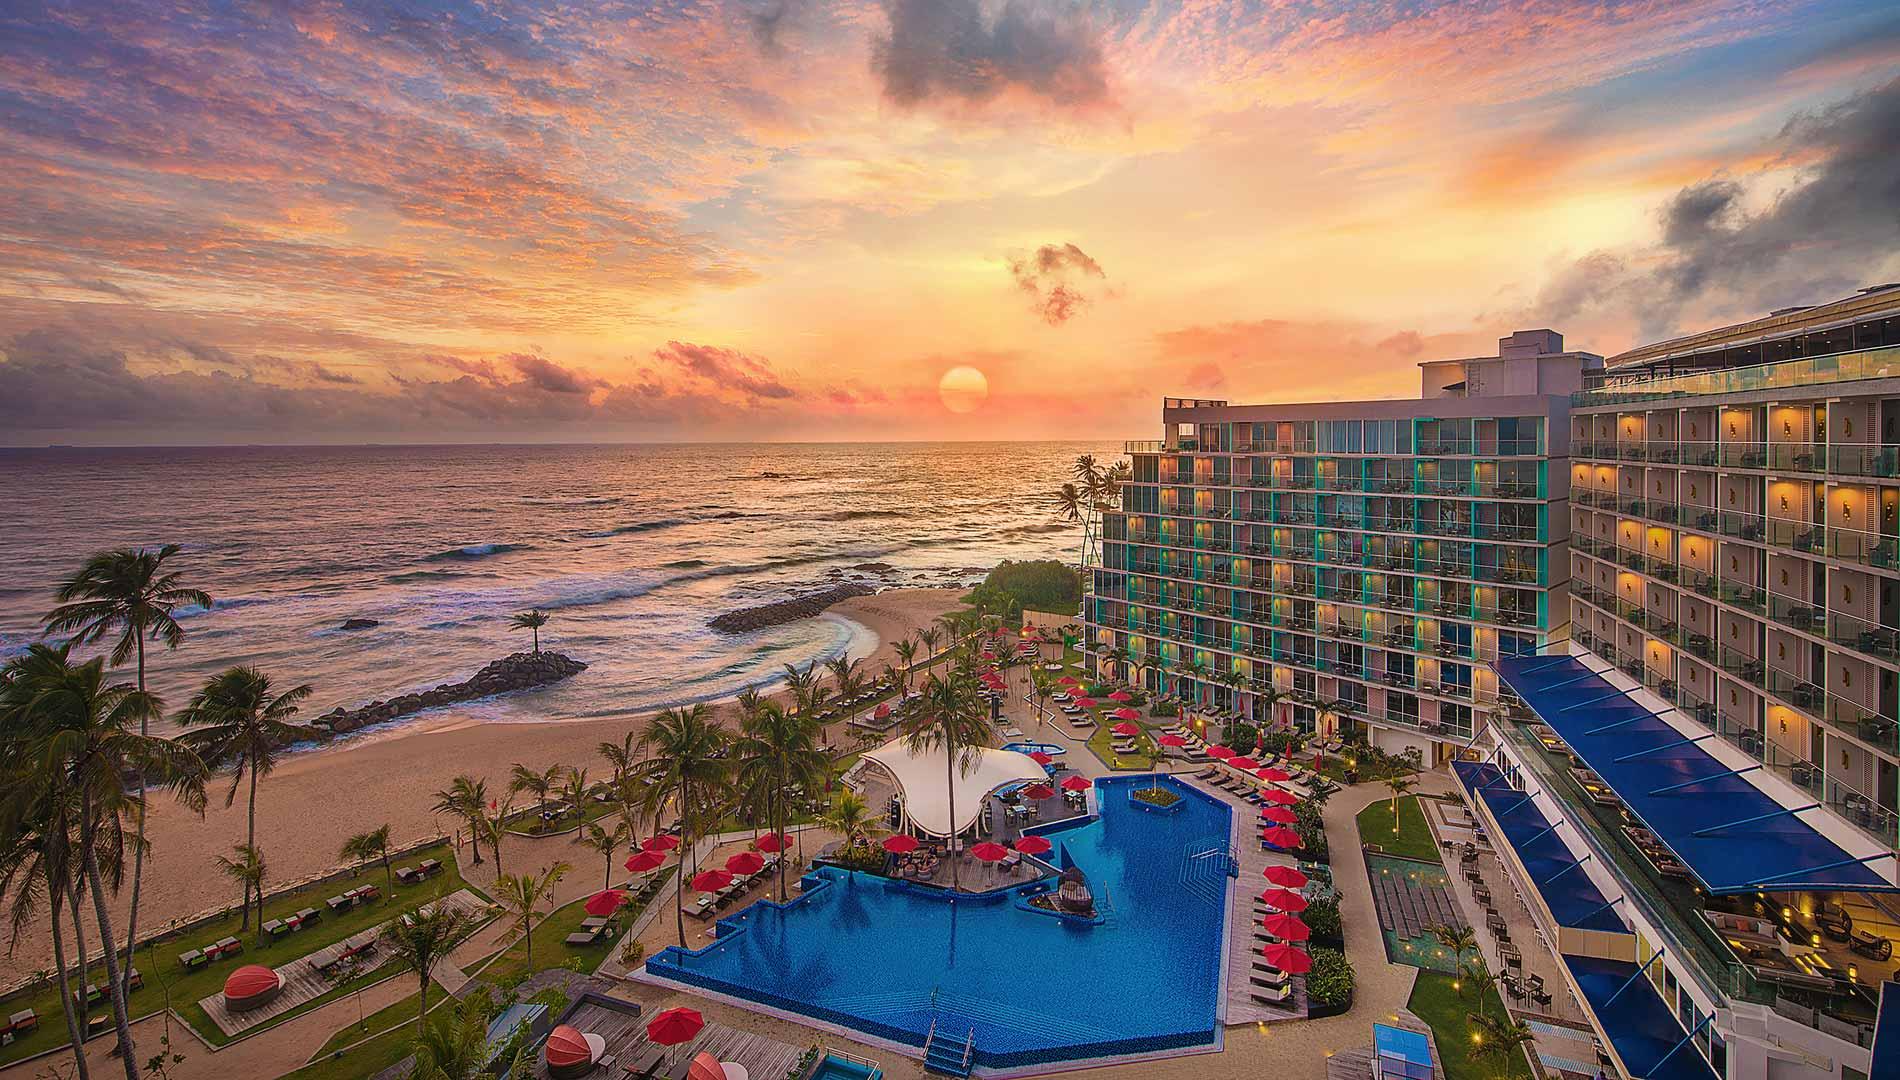 8 Things to Love About Amari Galle Sri Lanka